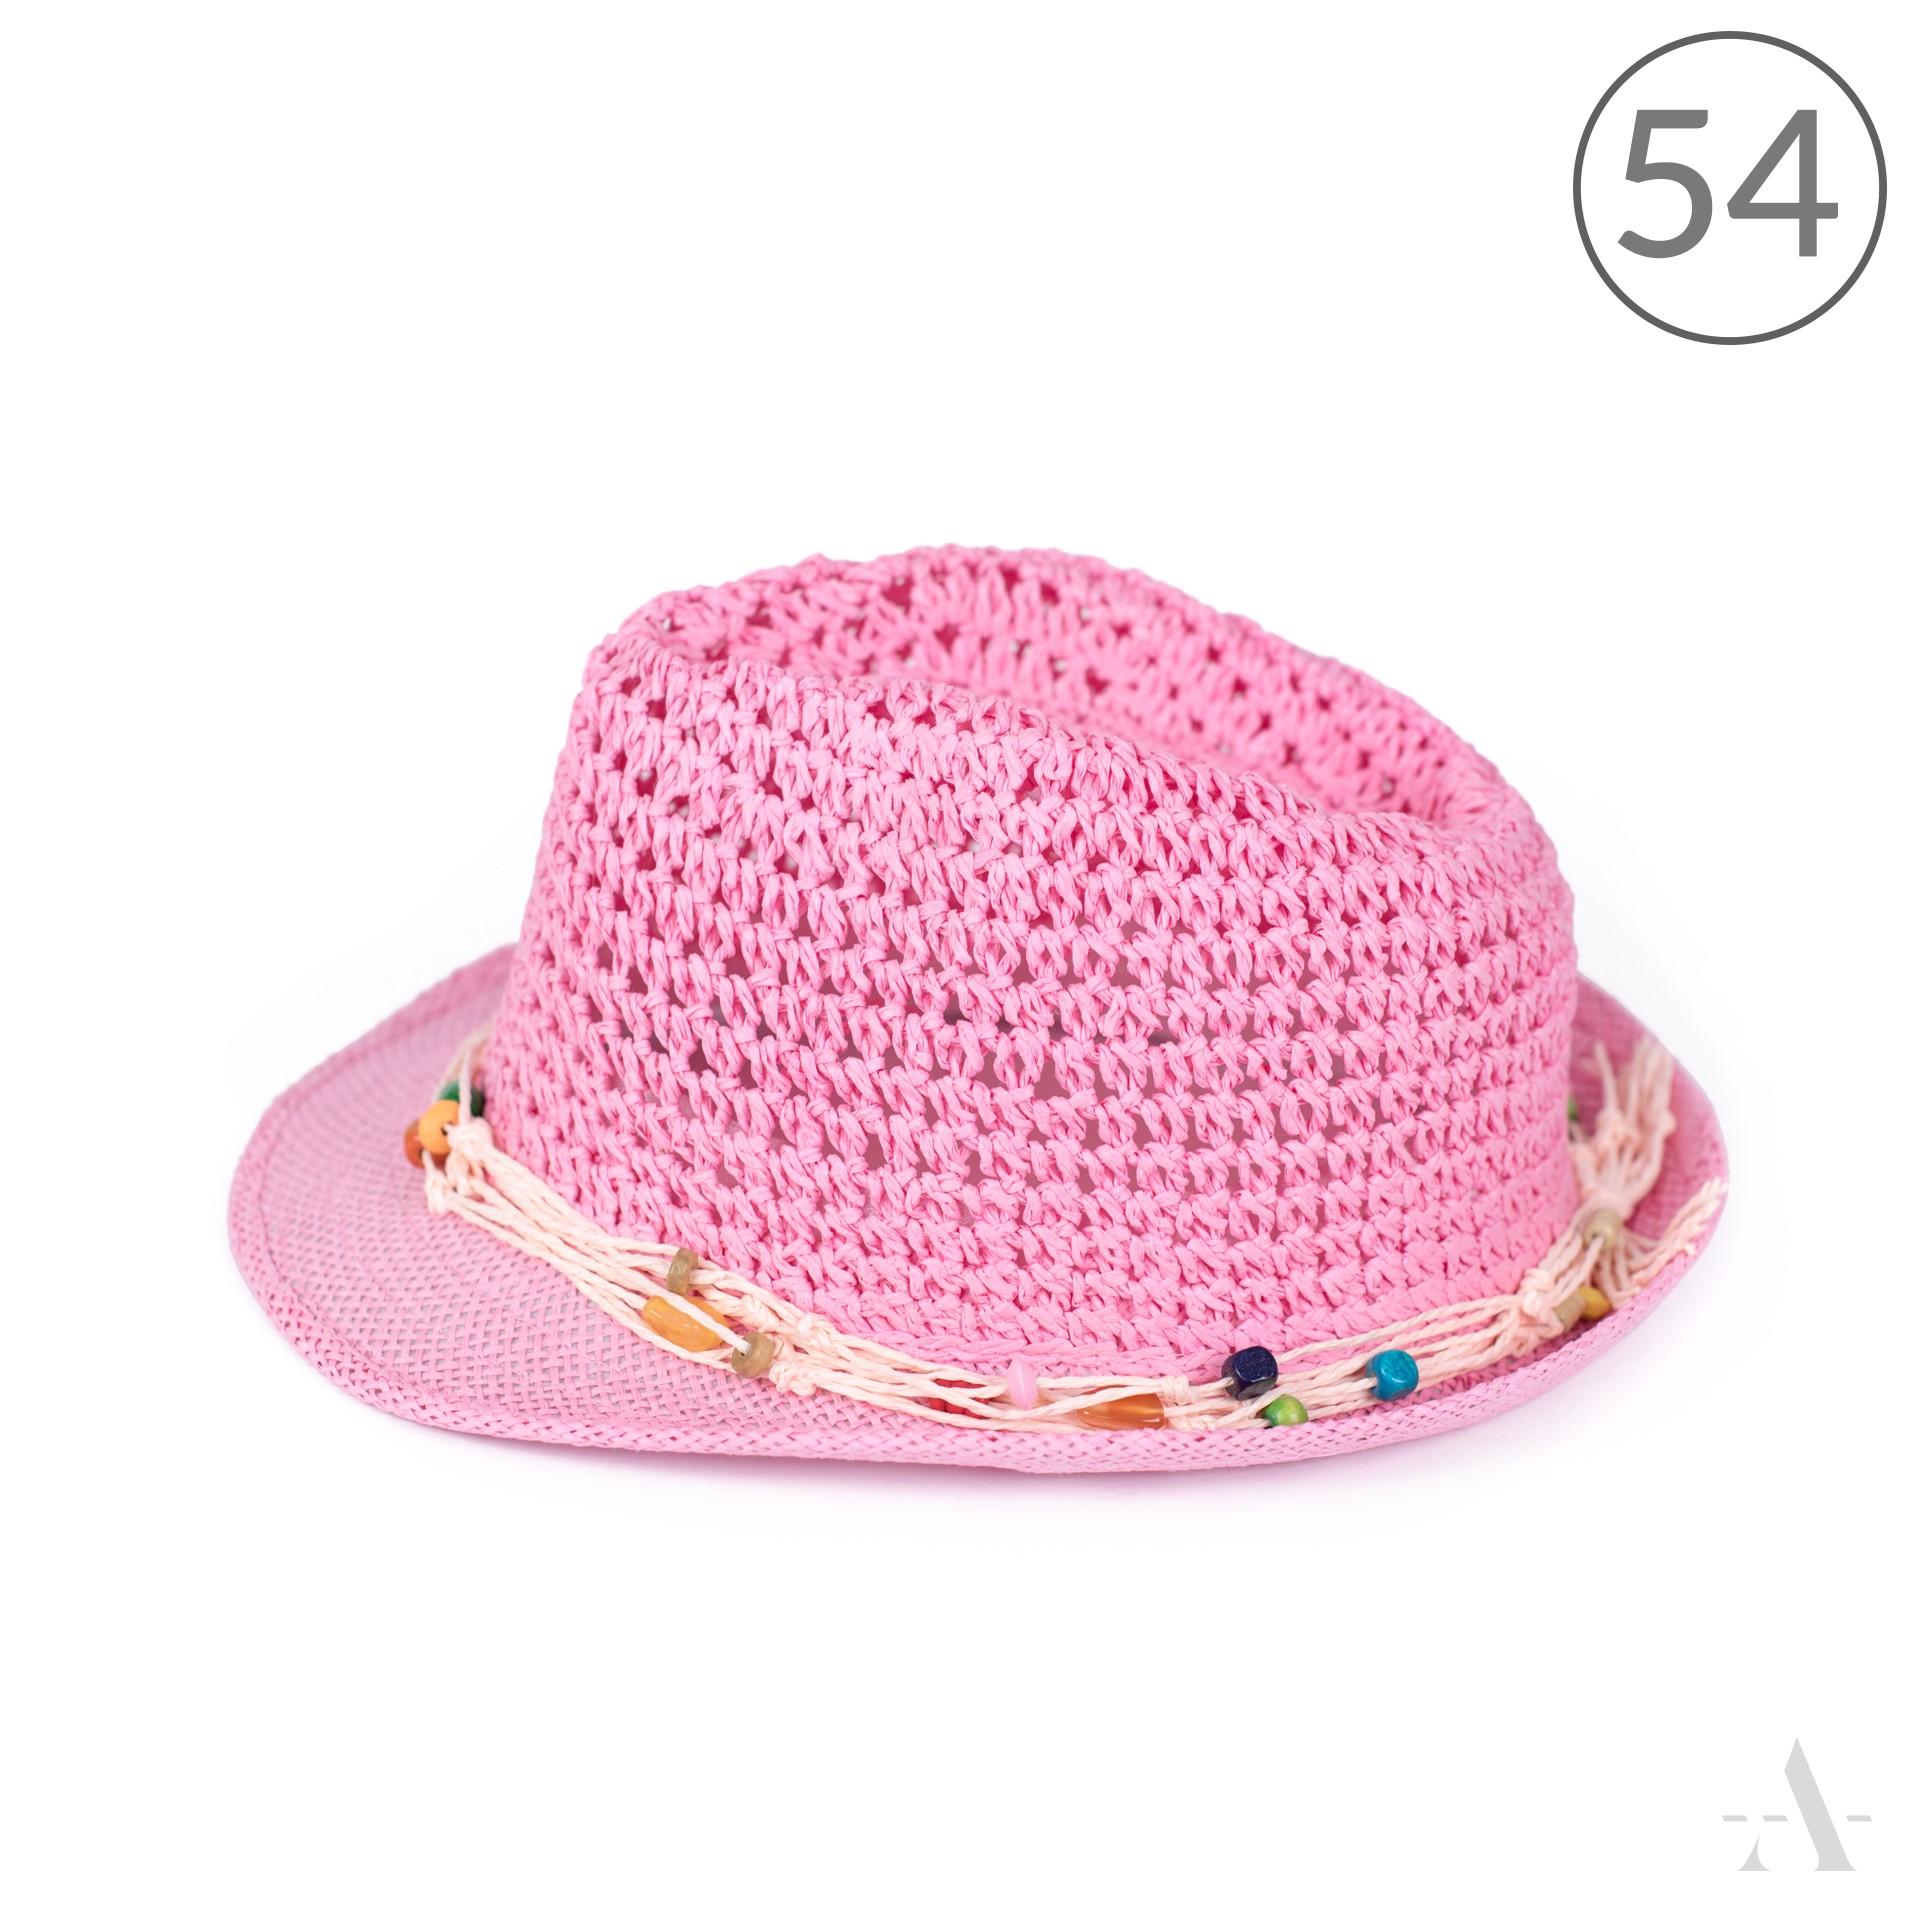 950aaff2c Art of Polo detský klobúk cz18202